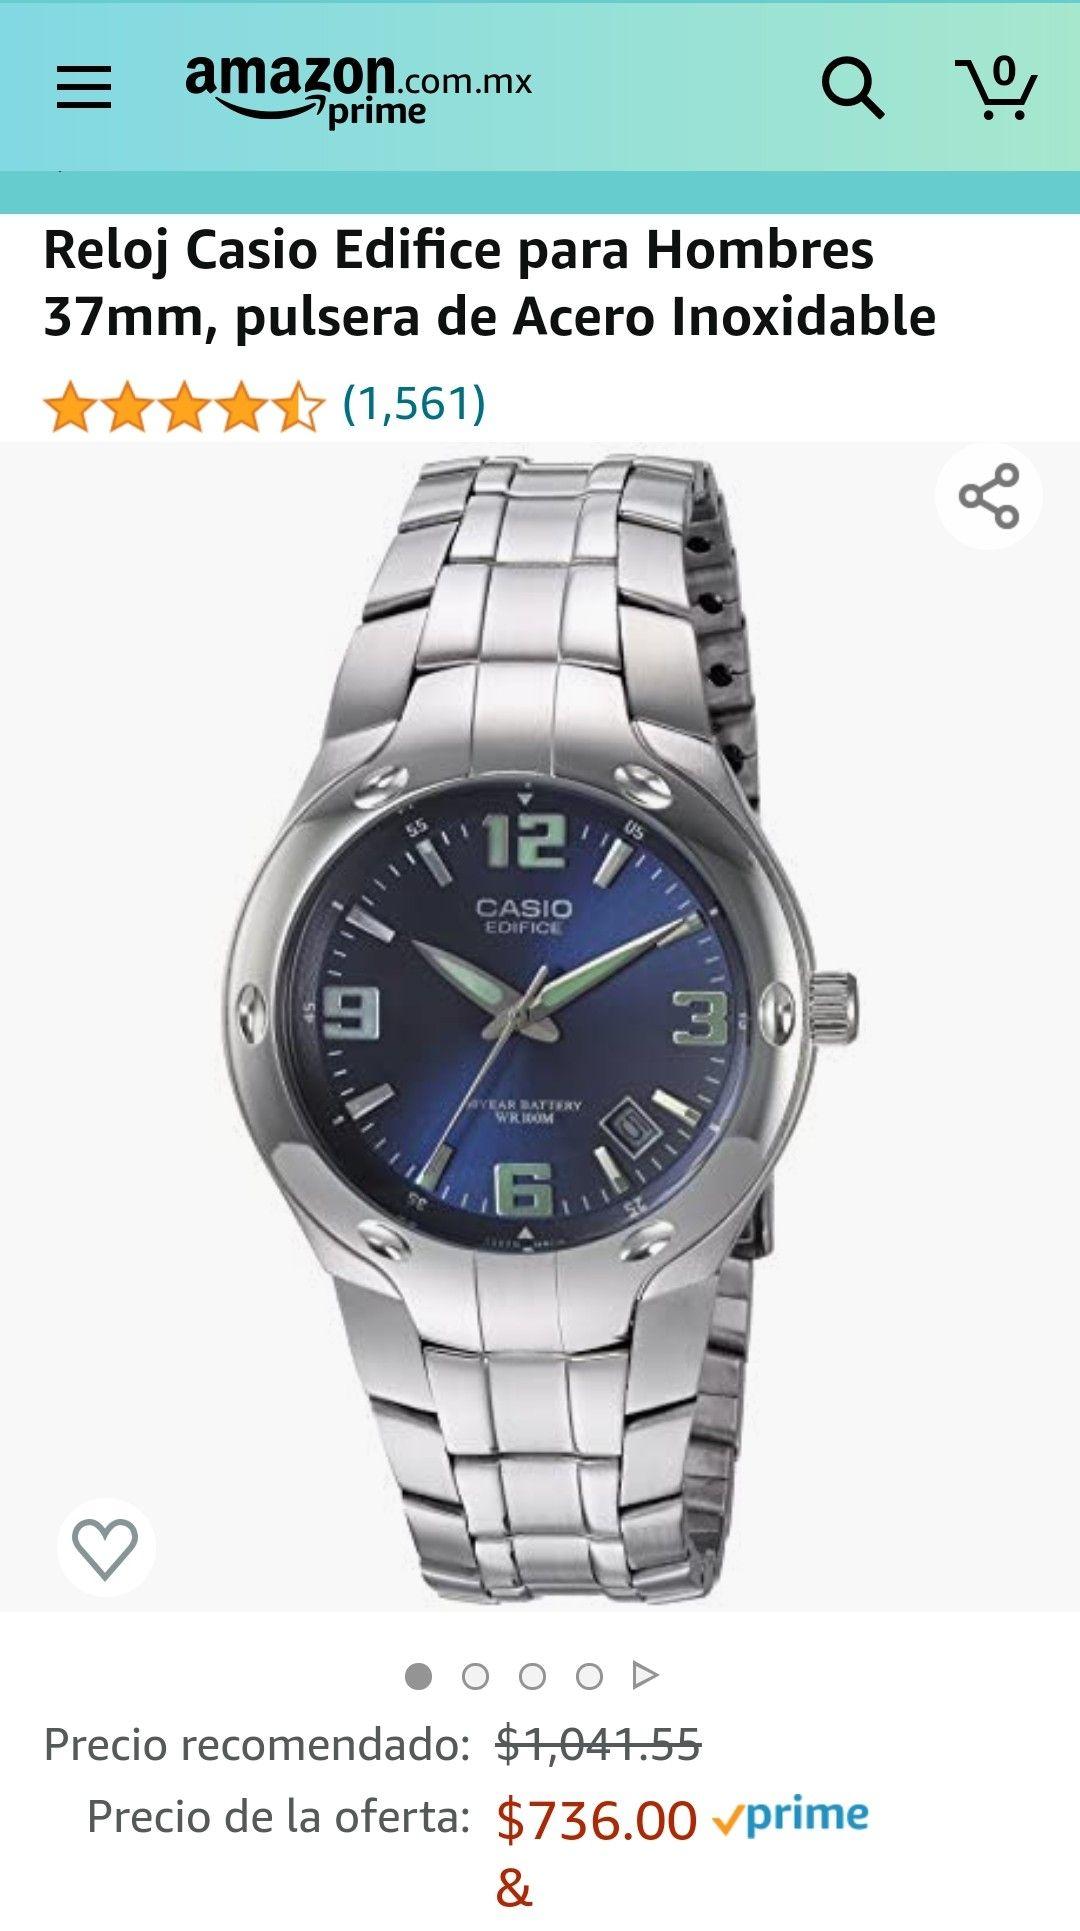 Amazon: Reloj Casio Edifice para Hombres 37mm